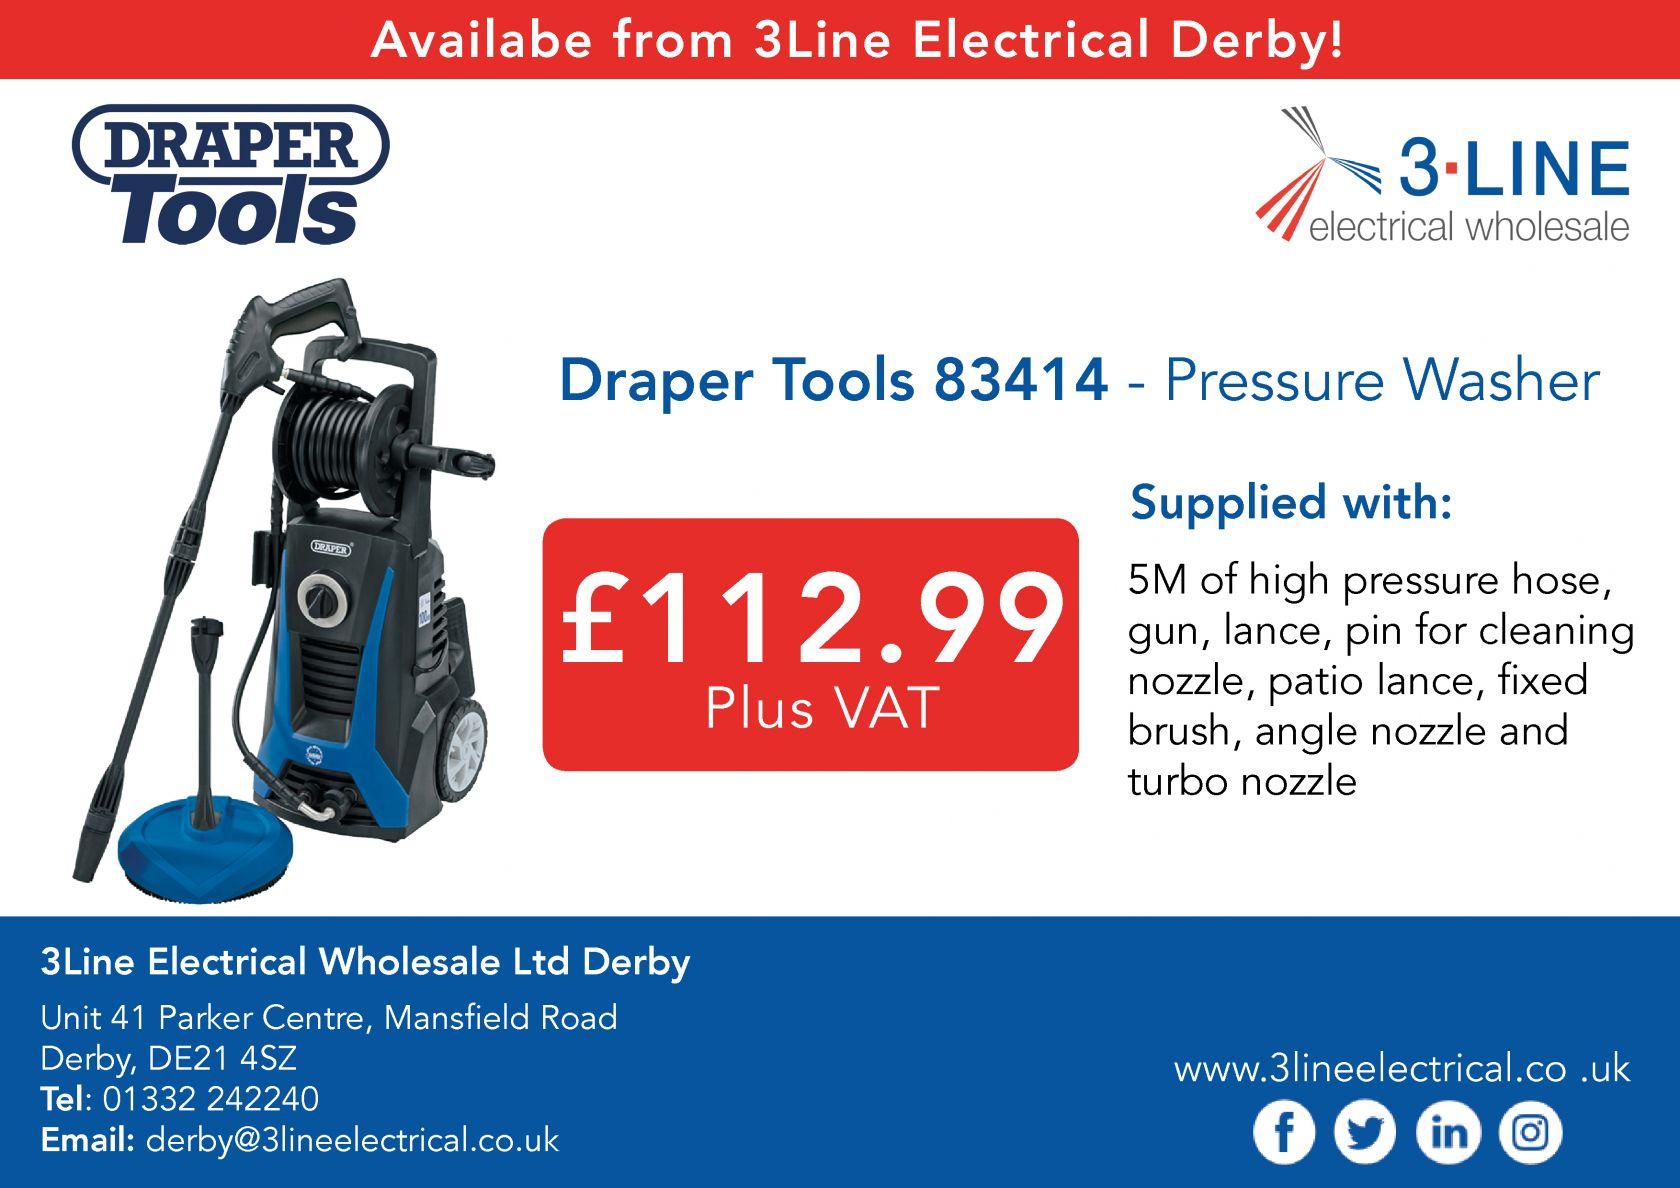 Draper Tools 83414 - Pressure Washer